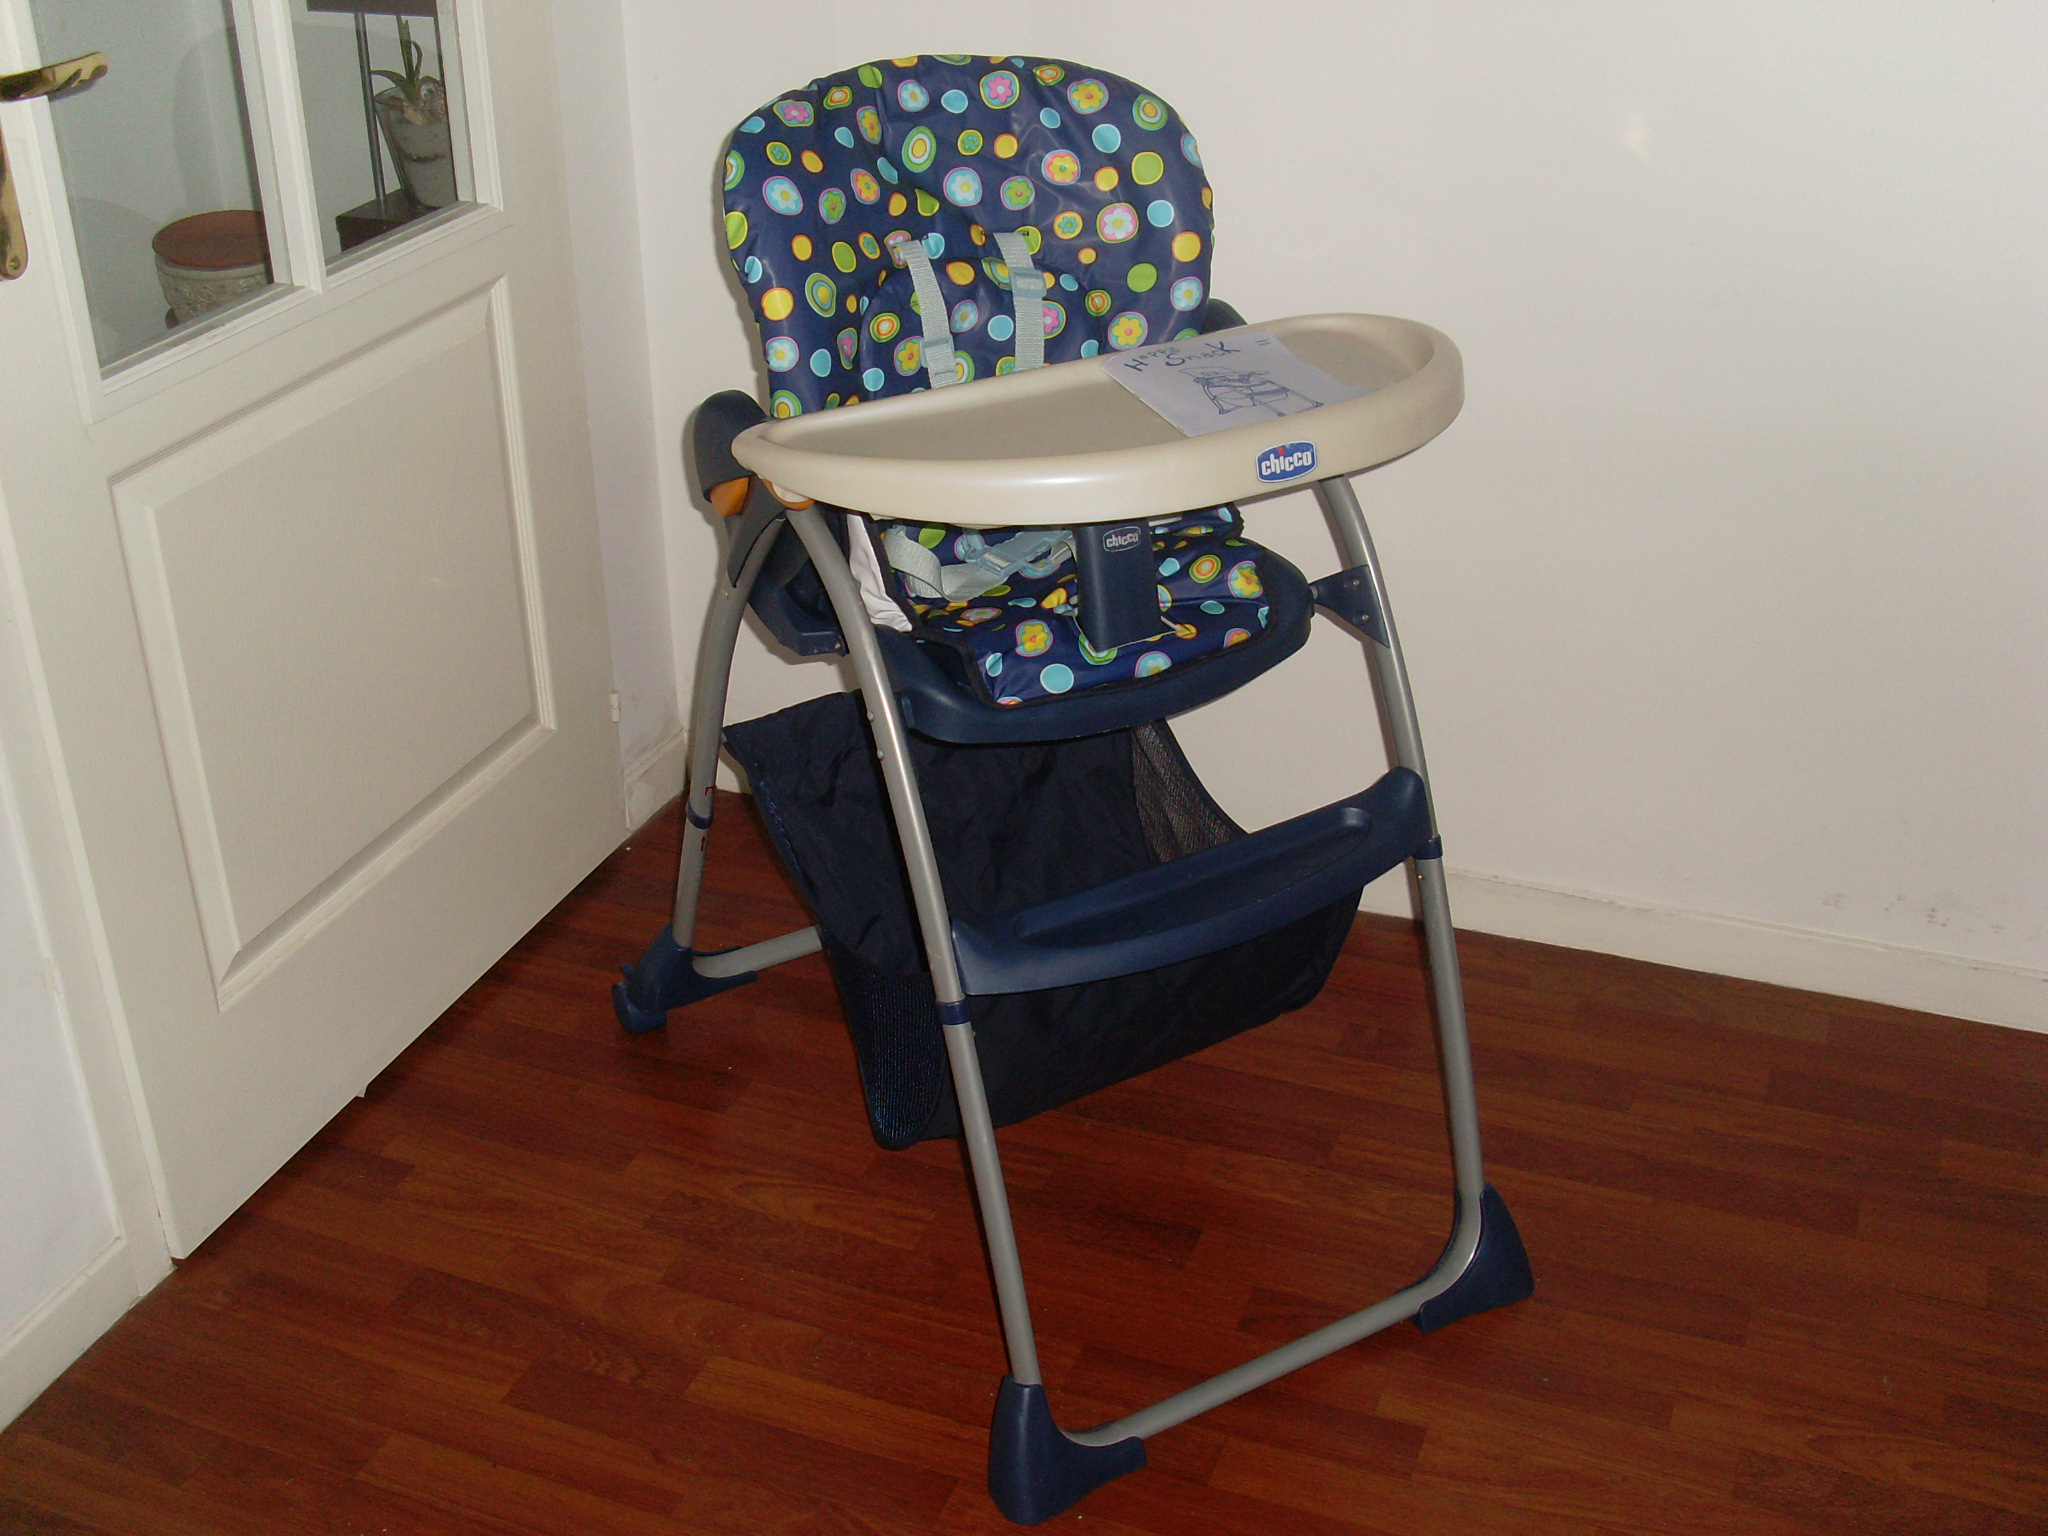 Chaise haute chicco vendus shiva59000 photos club for Chaise haute chicco